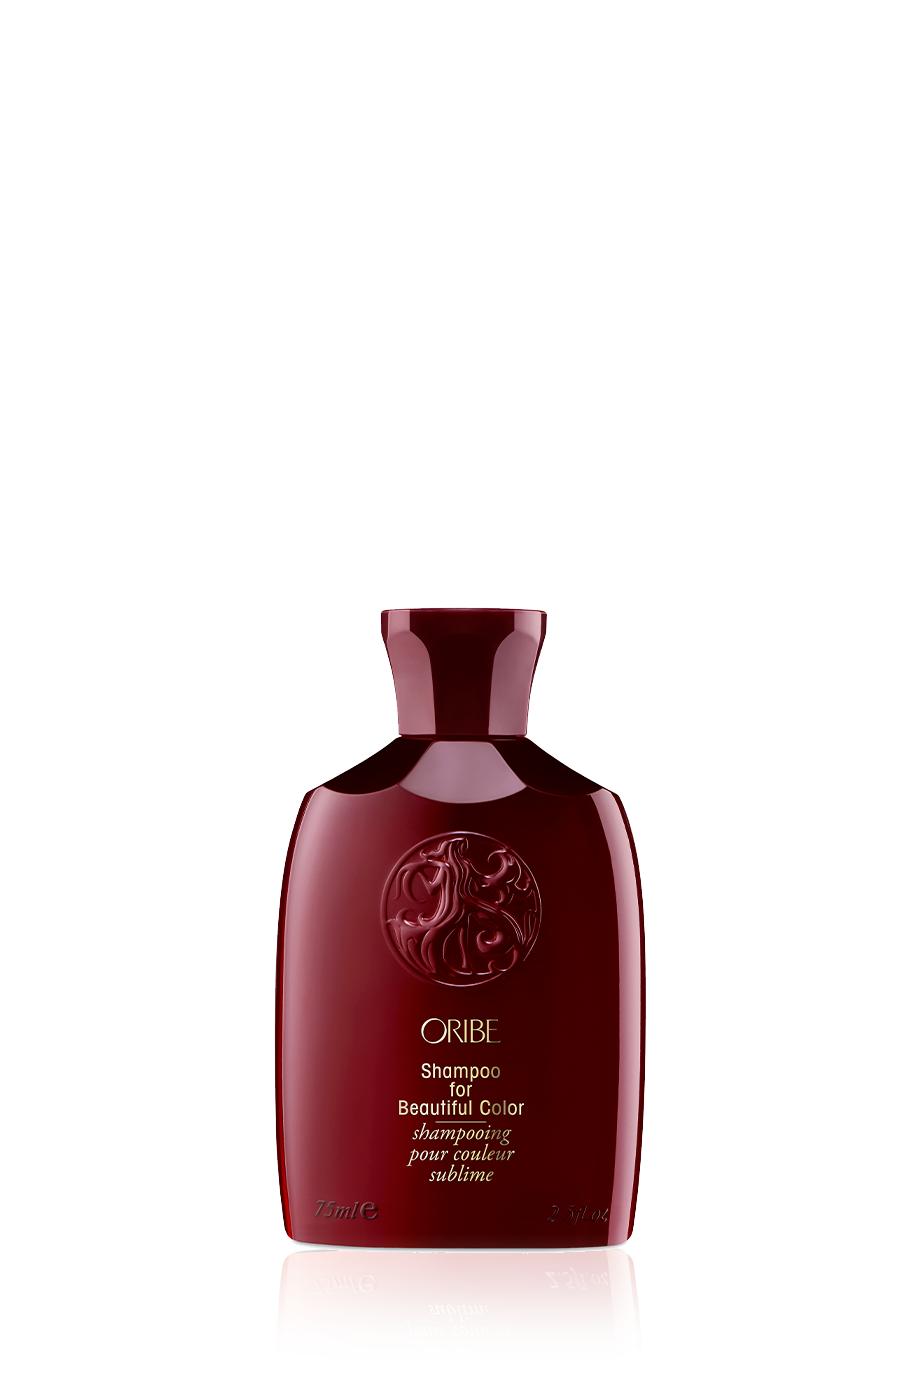 Shampoo for Beautiful Color 75ml Travel   Шампунь для окрашенных волос